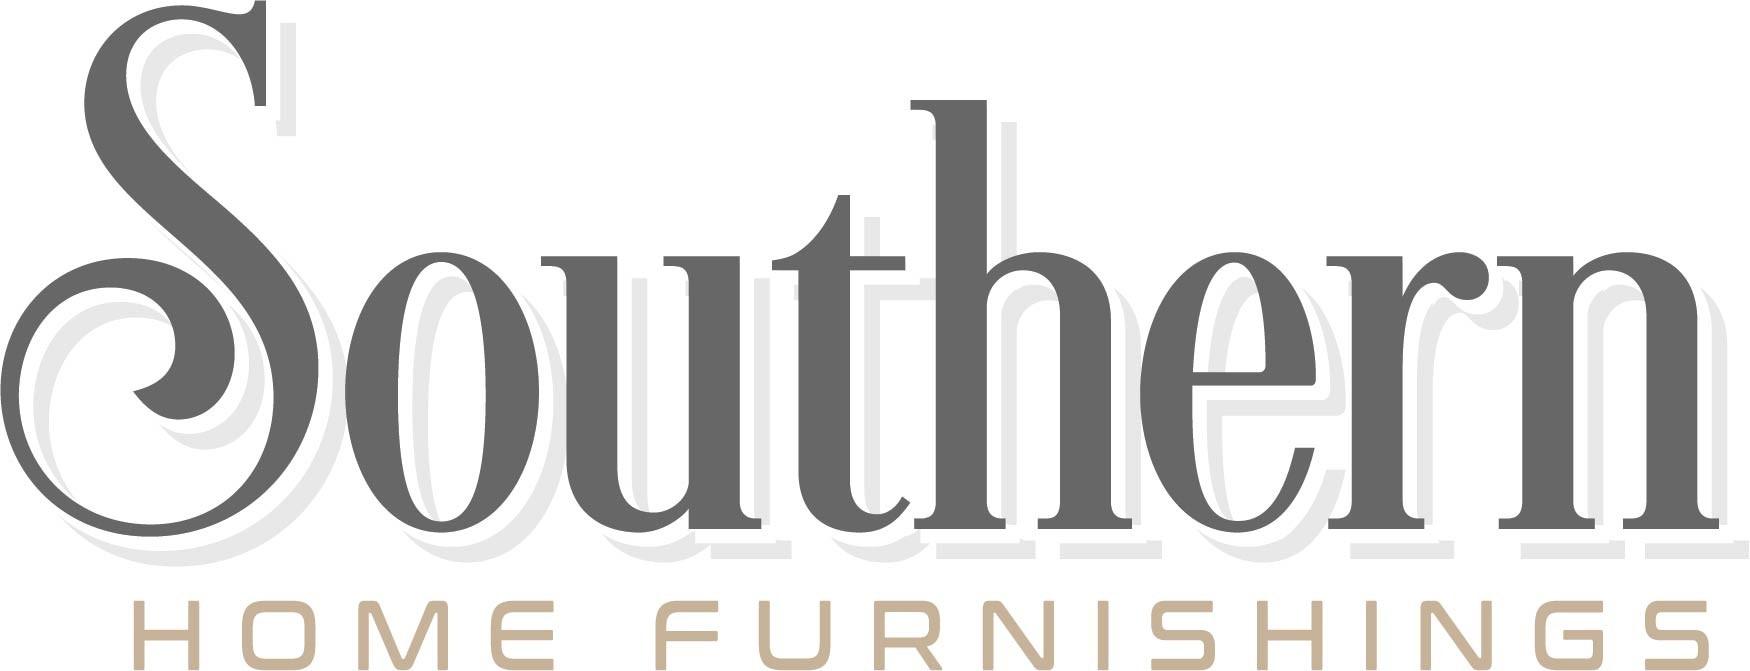 Southern Home Furnishings